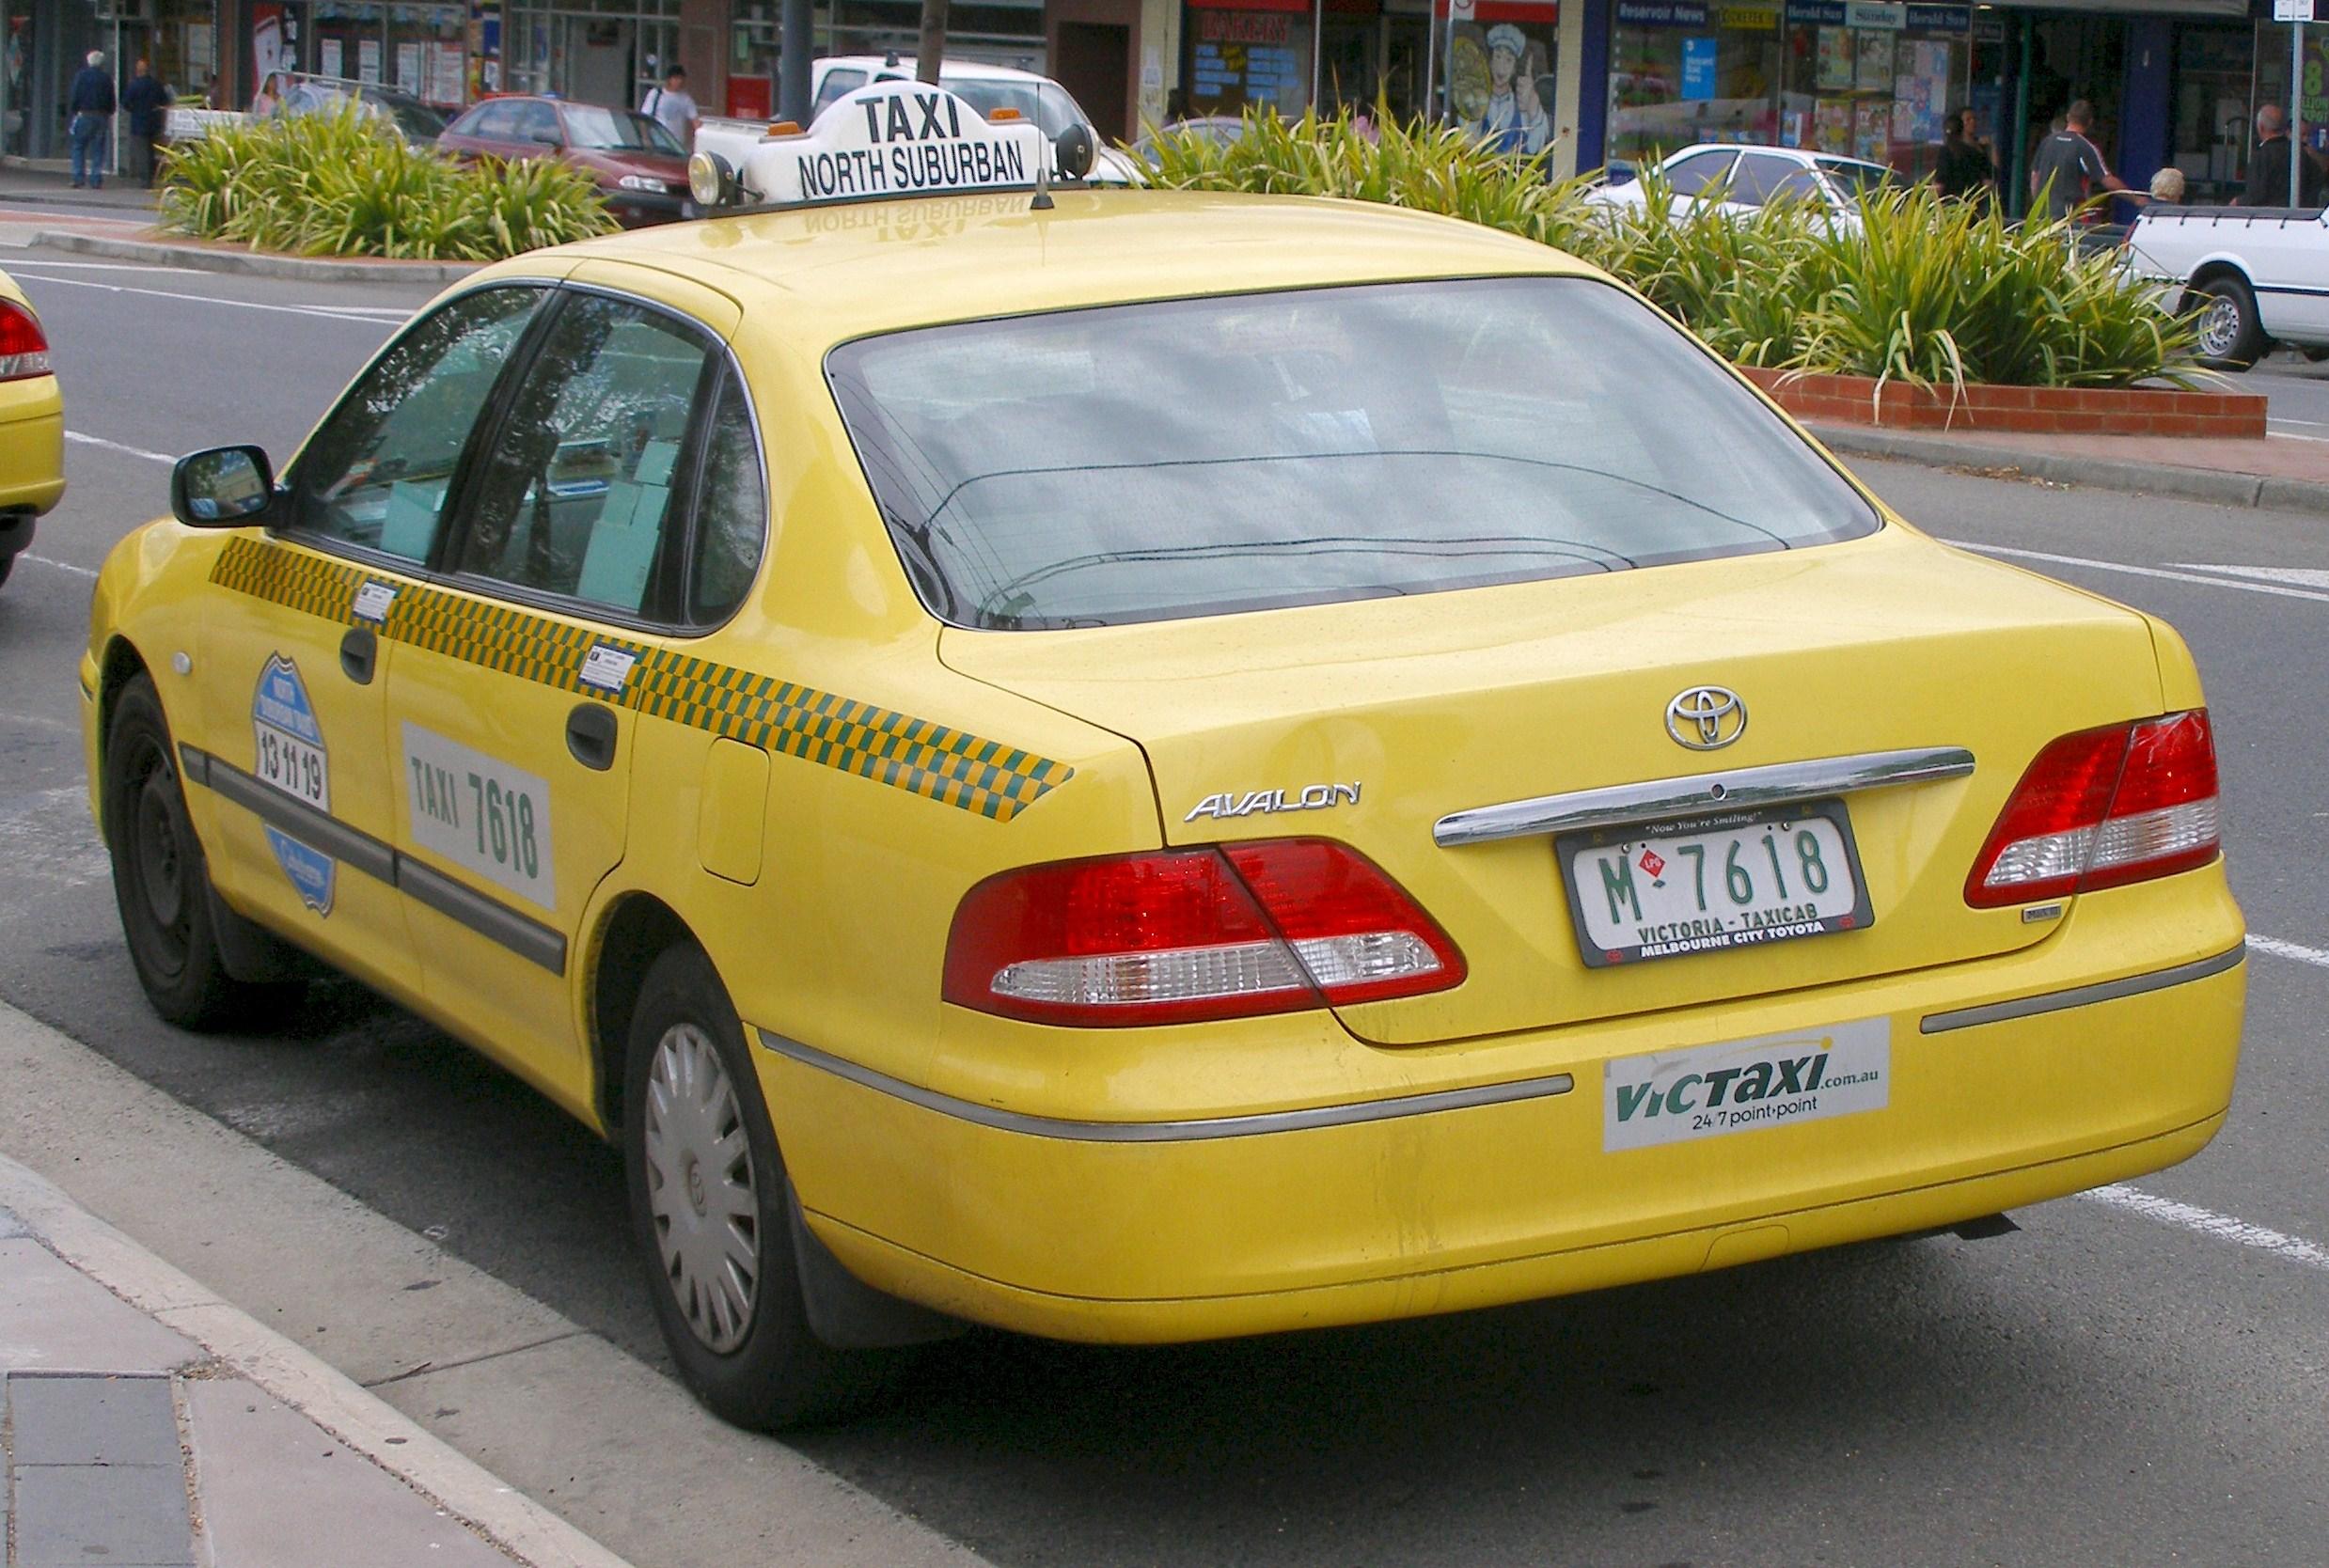 File:2003-2005 Toyota Avalon (MCX10R Mark III) taxi pack ...